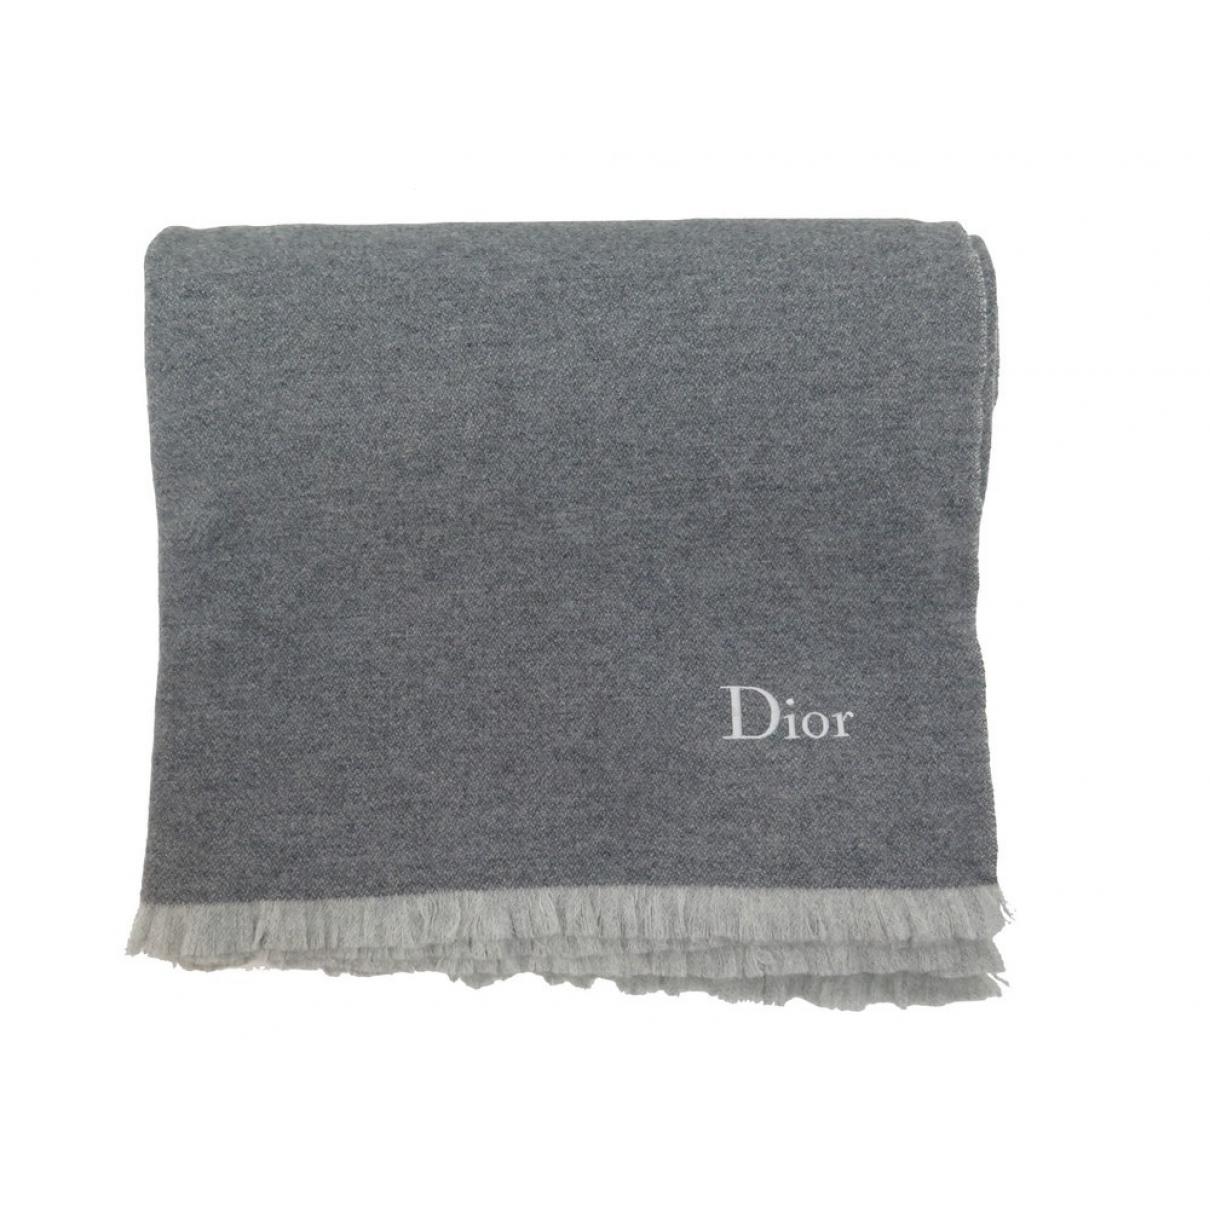 Textil de hogar de Lana Dior